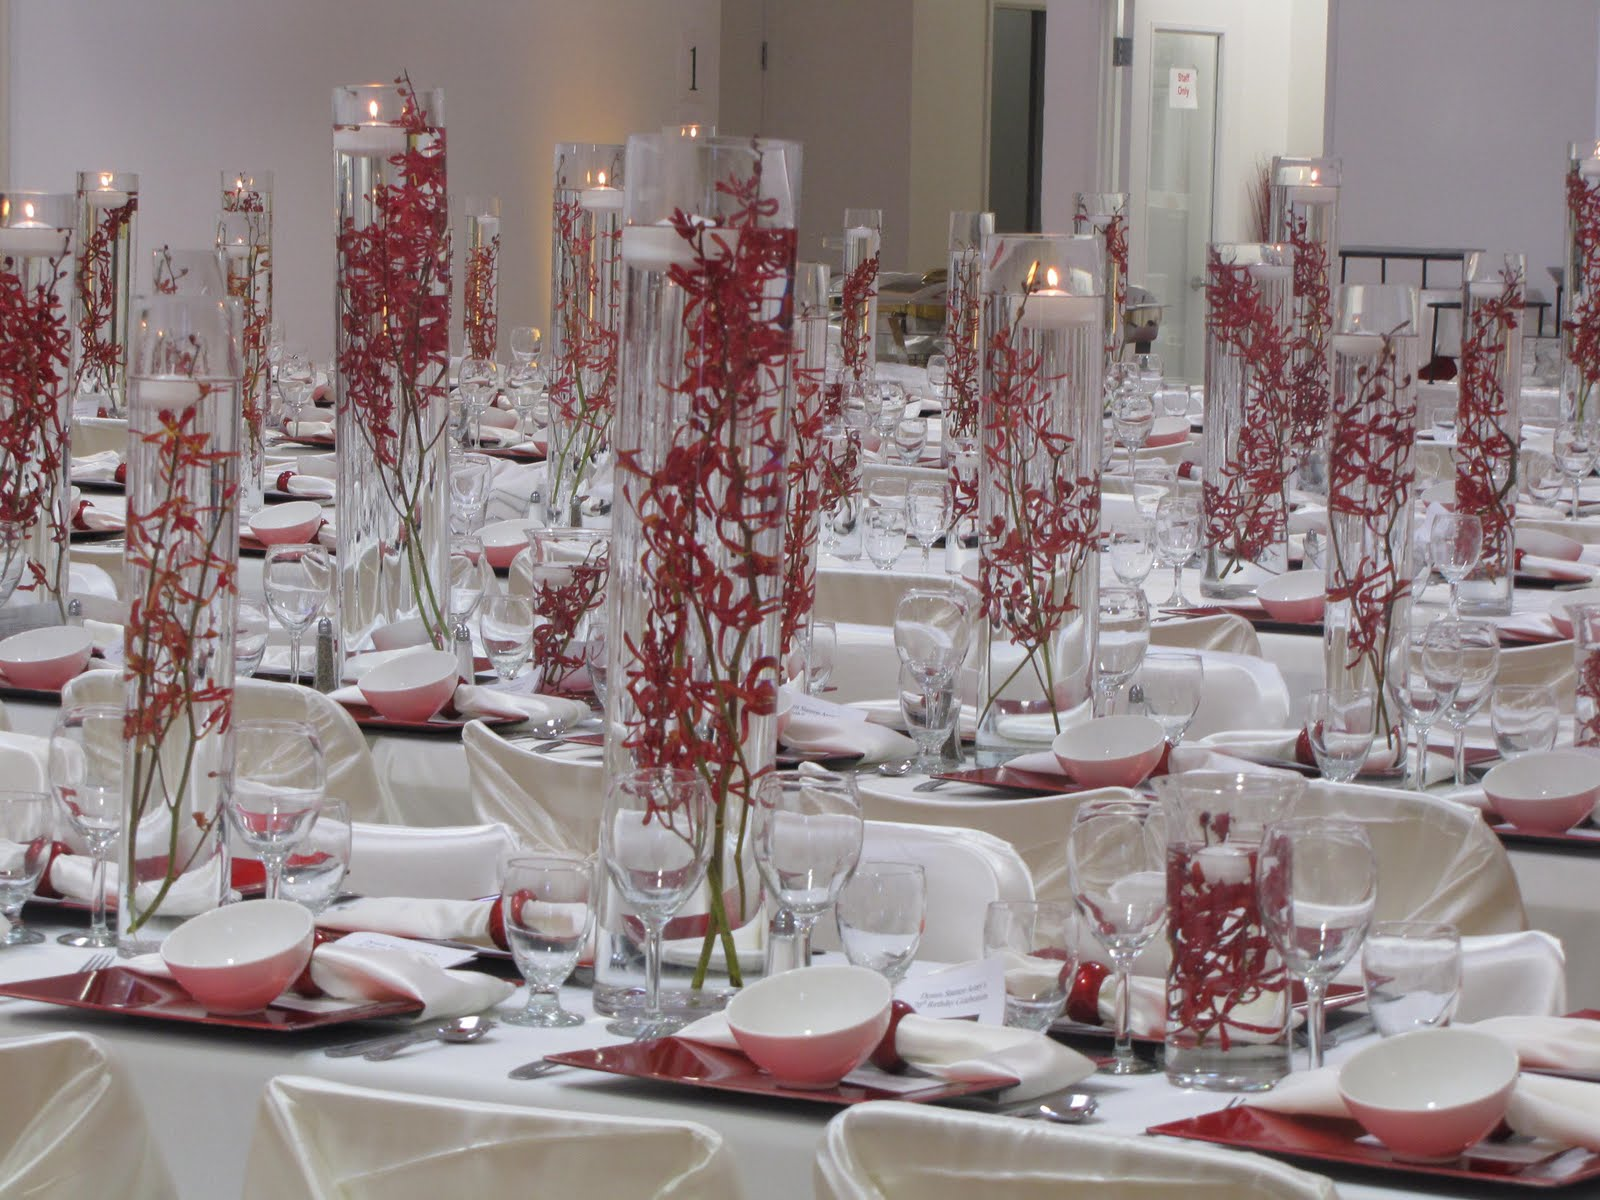 San Diego Coronado Del Mar Wedding Florist And Planner SaveEnlarge Stuck Together Stationery Decorations 70th Birthday